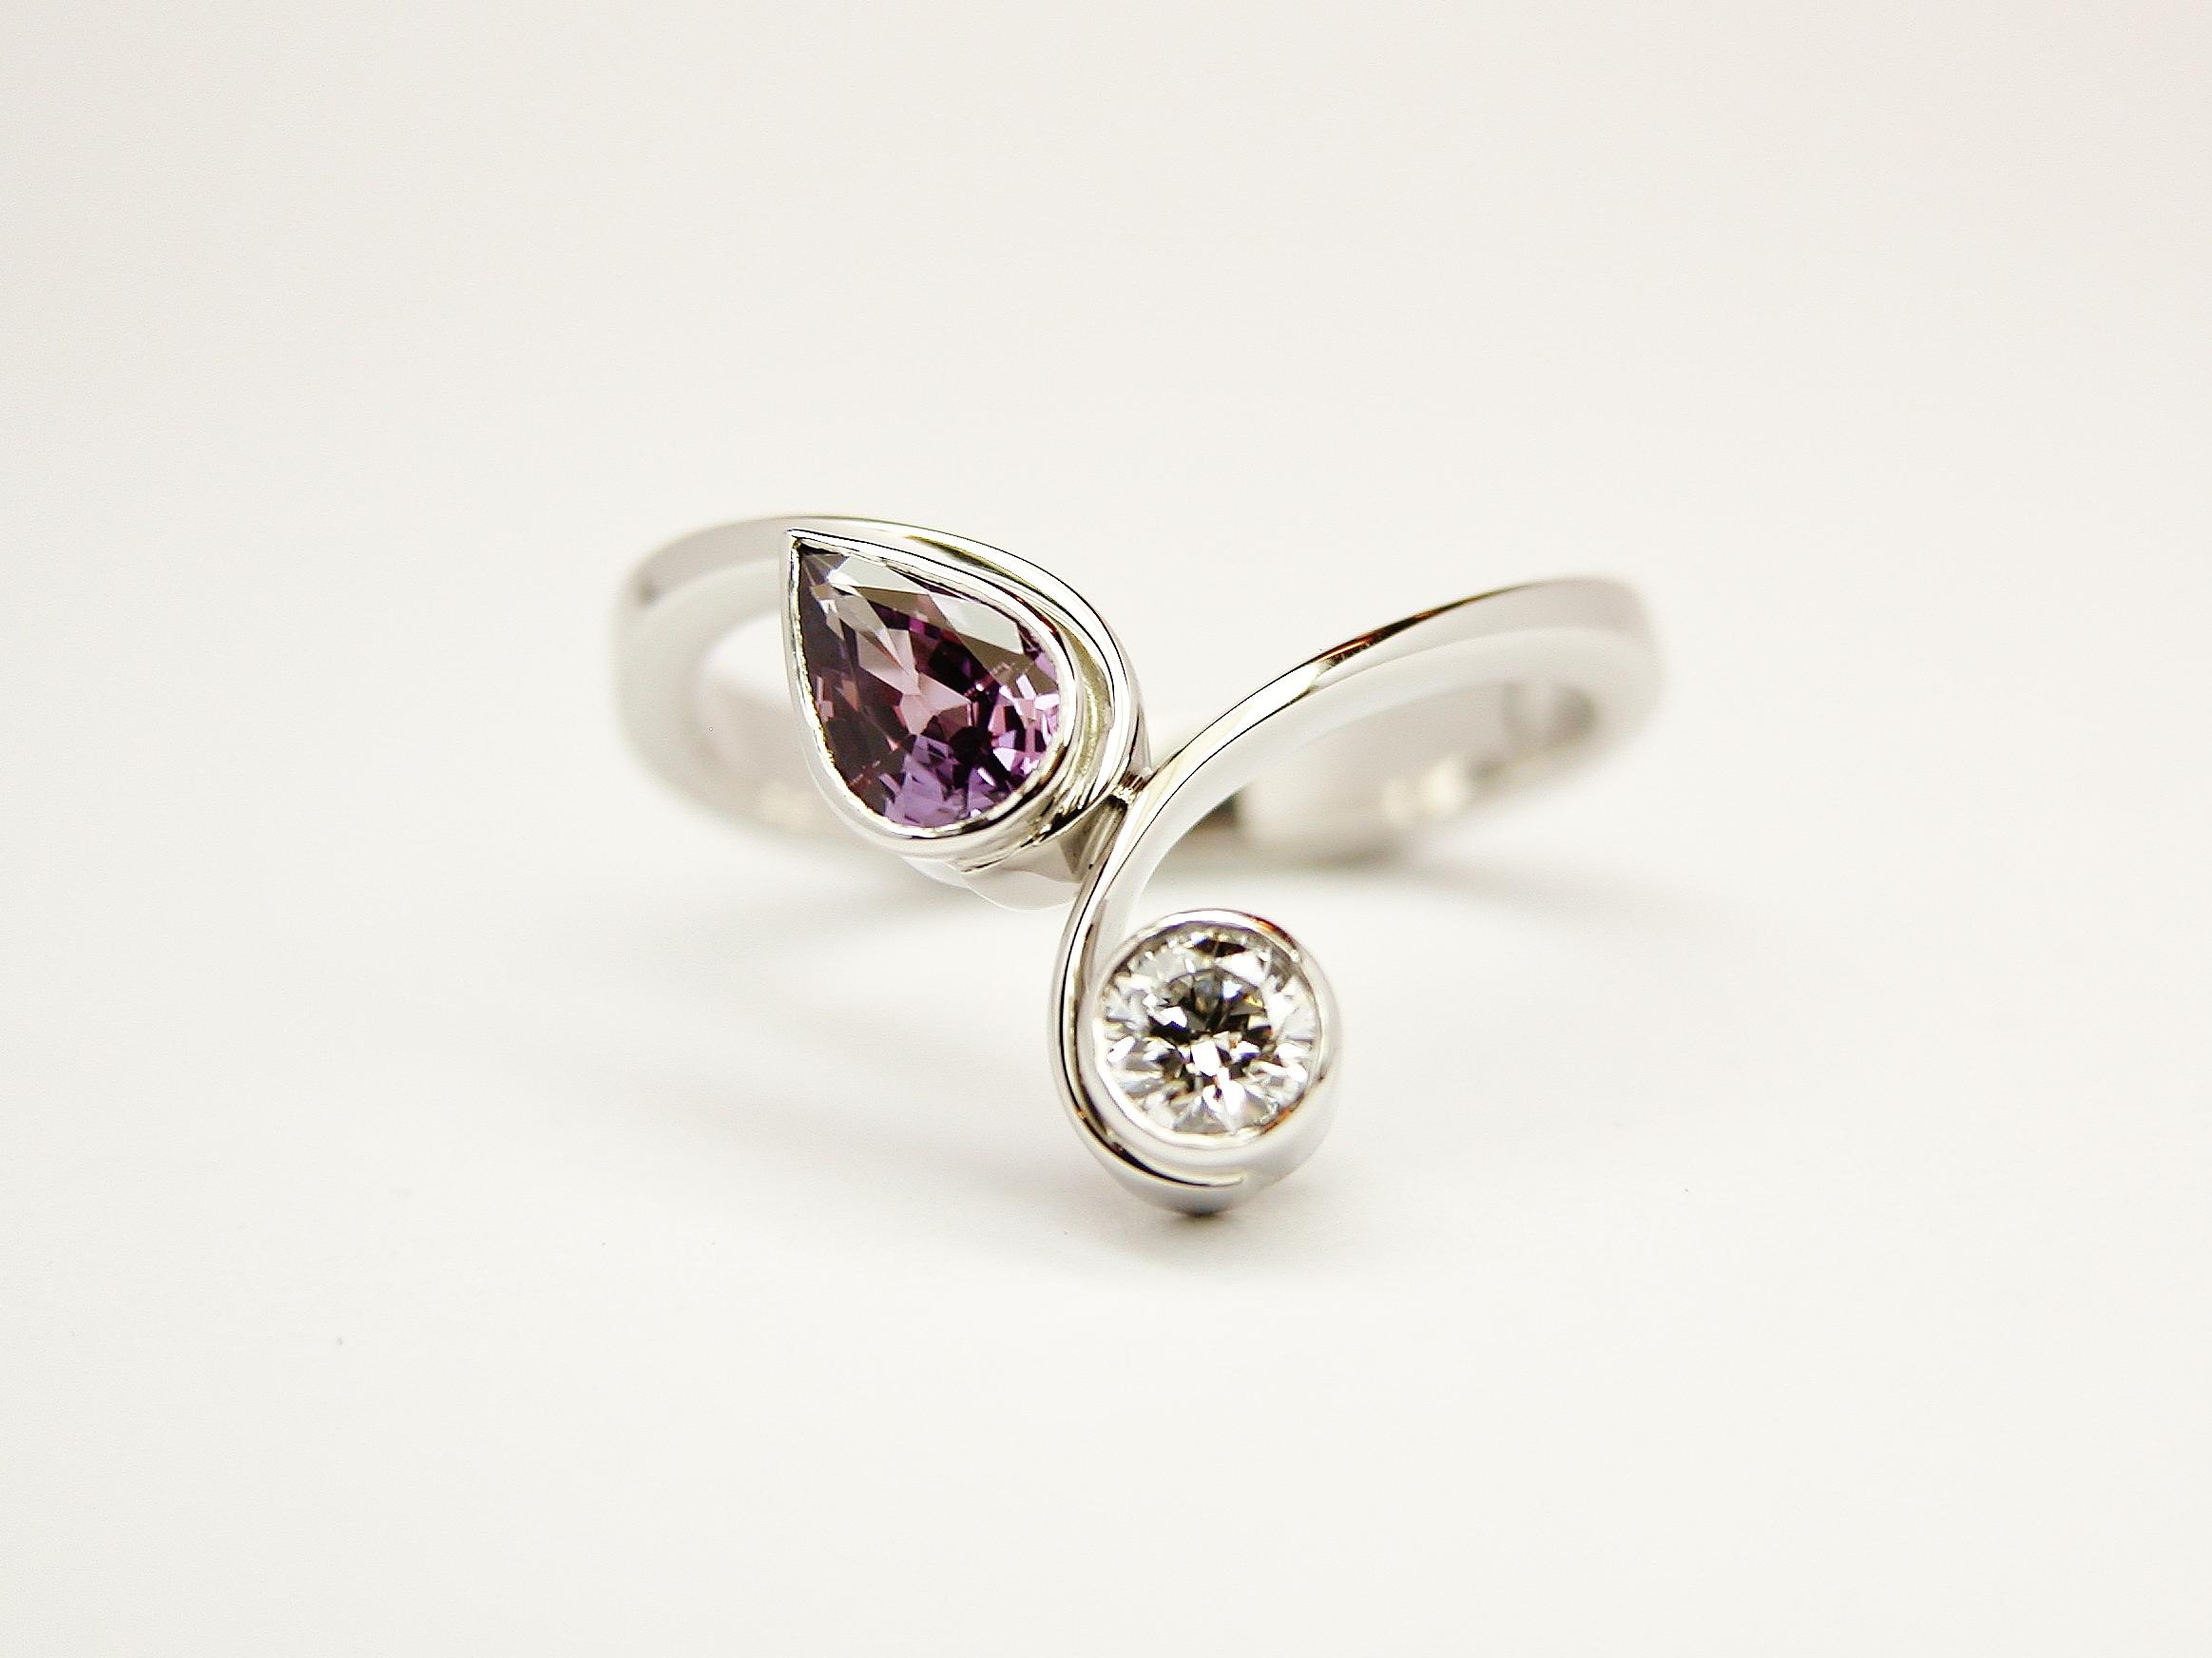 Pear shaped purple sapphire and round brilliant cut diamond rub-over set 2 stone curly wishbone style ring mounted in palladium & platinum.